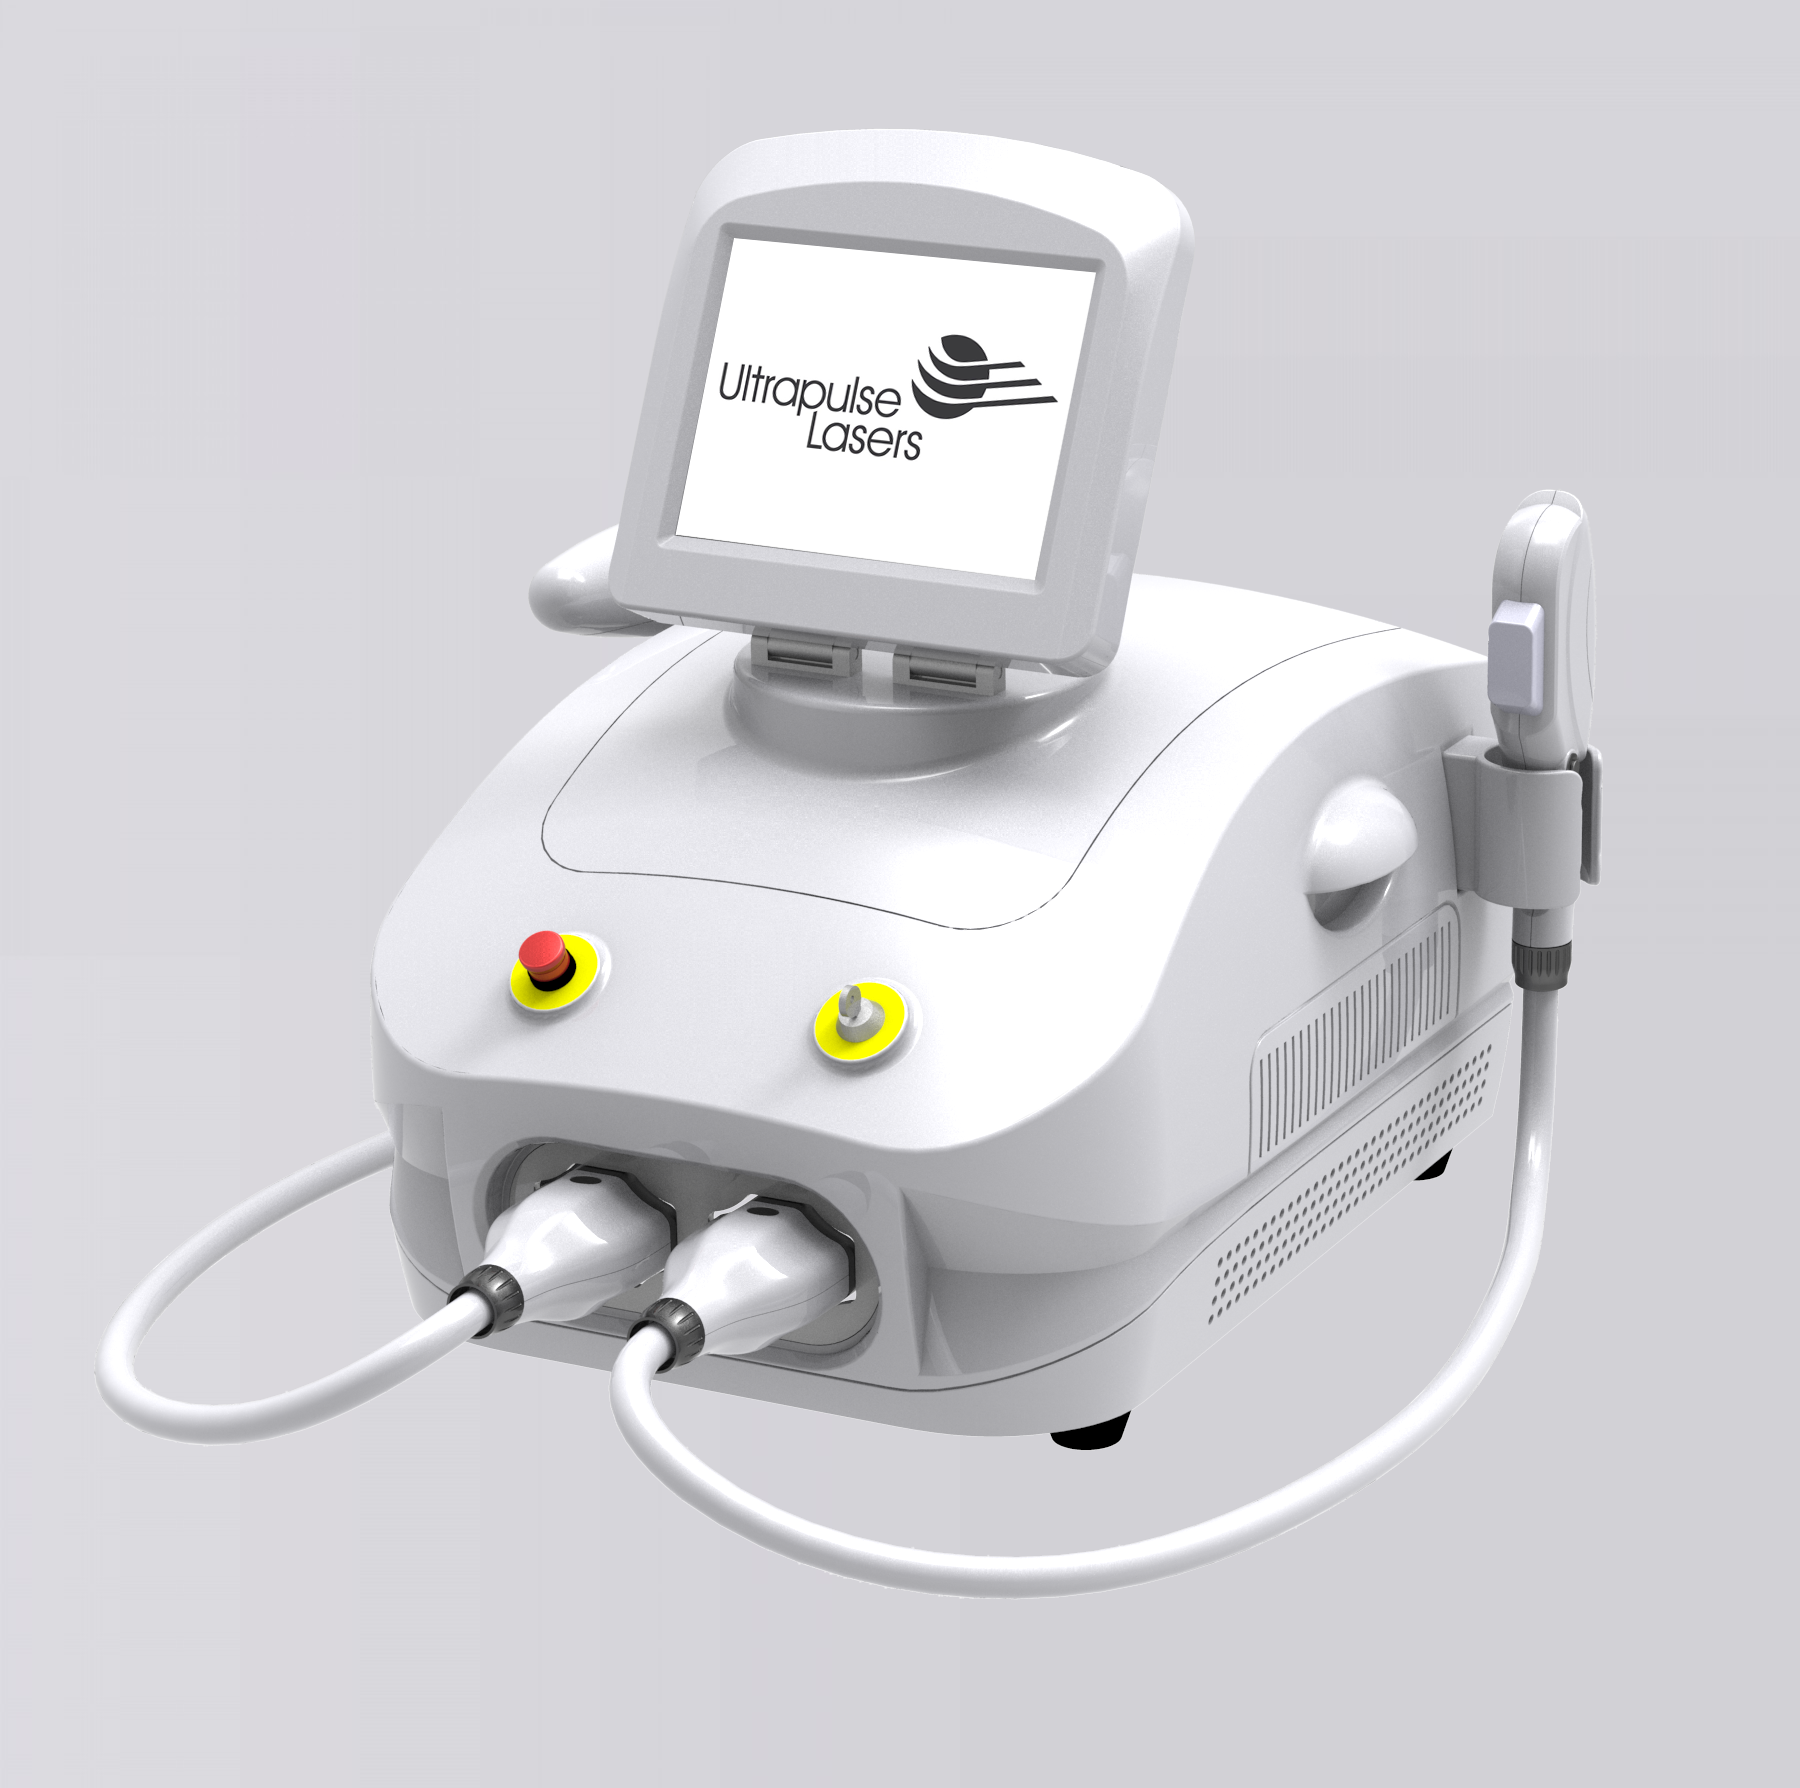 Combo Shr Ipl Tattoo Removal Lasers Amp Ipl Machines